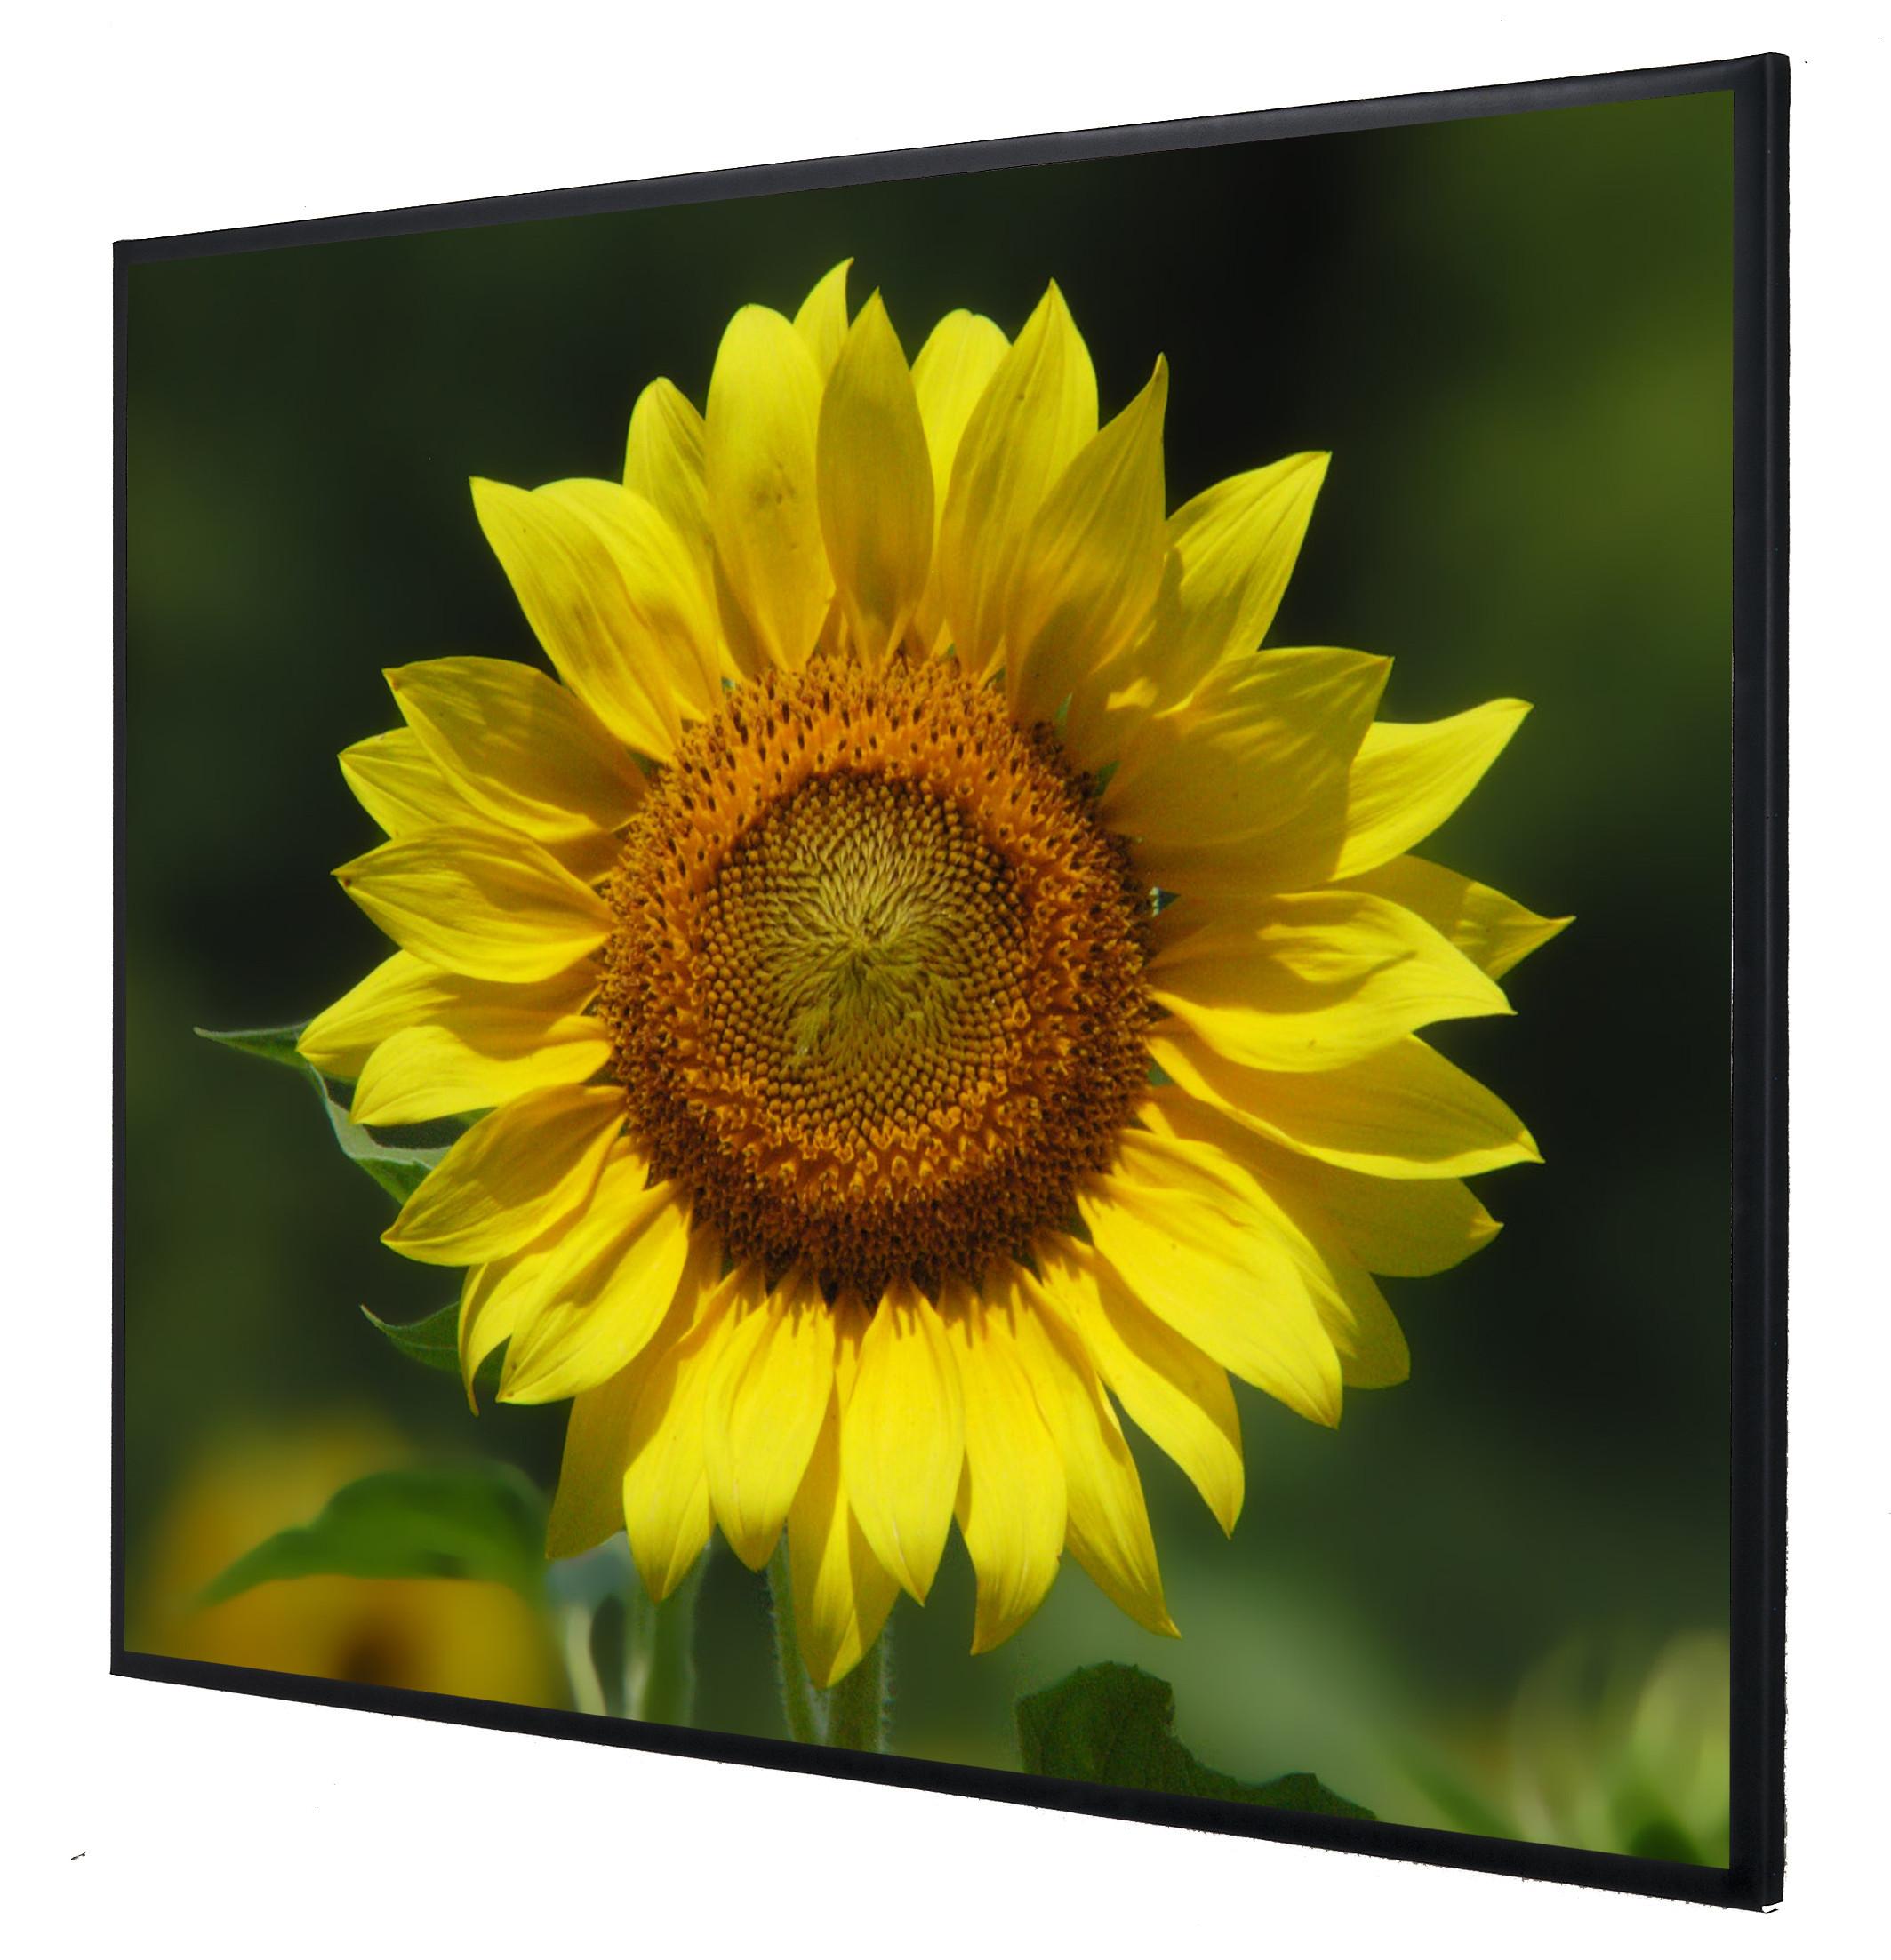 Vision Light 160 x 120 cm video format med Veltex og ReAct filmdug